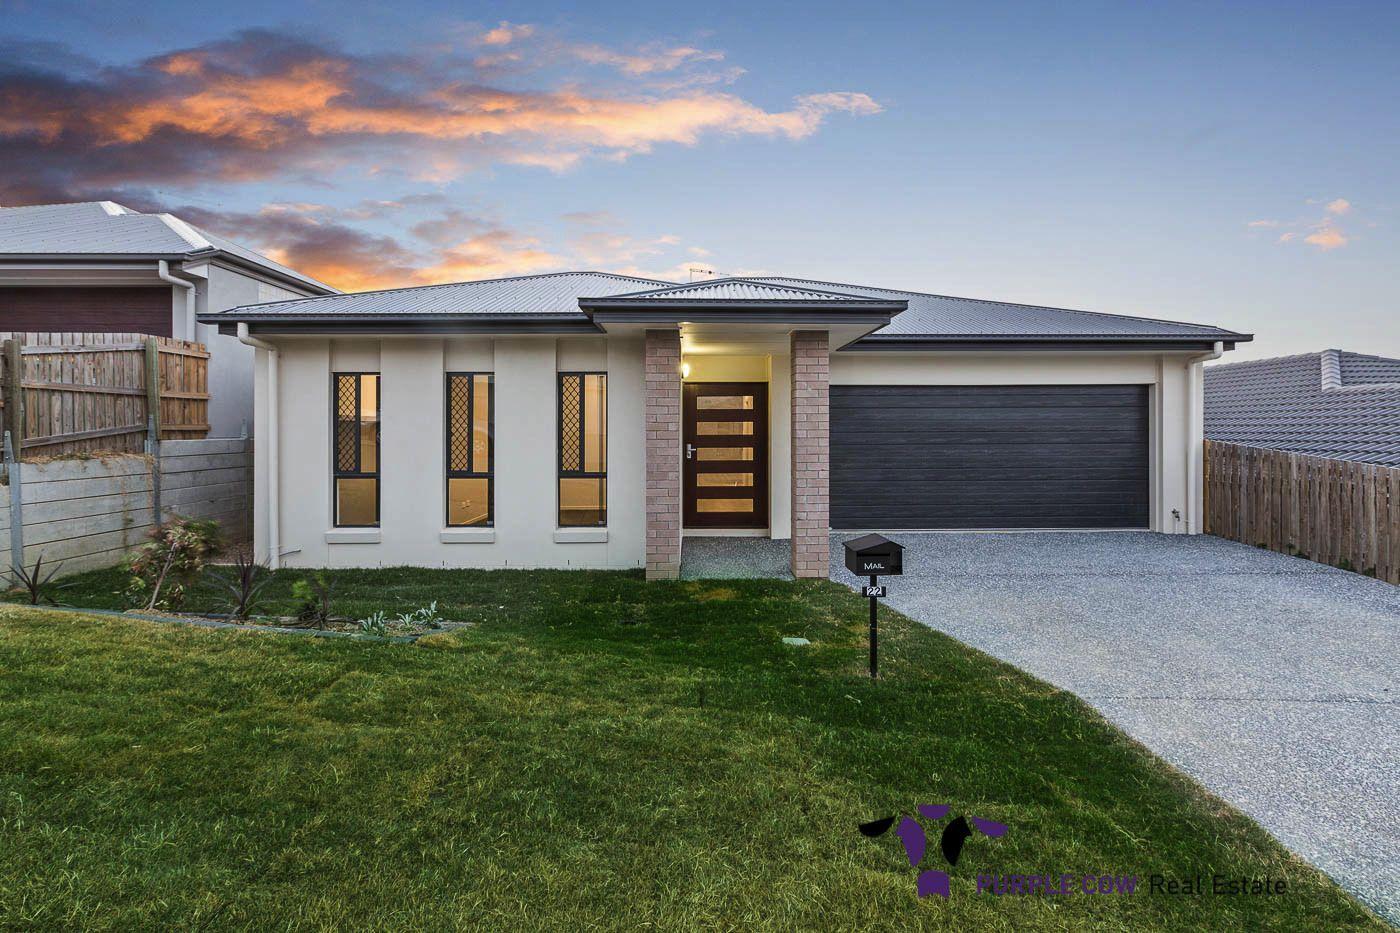 22 Barrow St, Springfield Lakes QLD 4300, Image 1